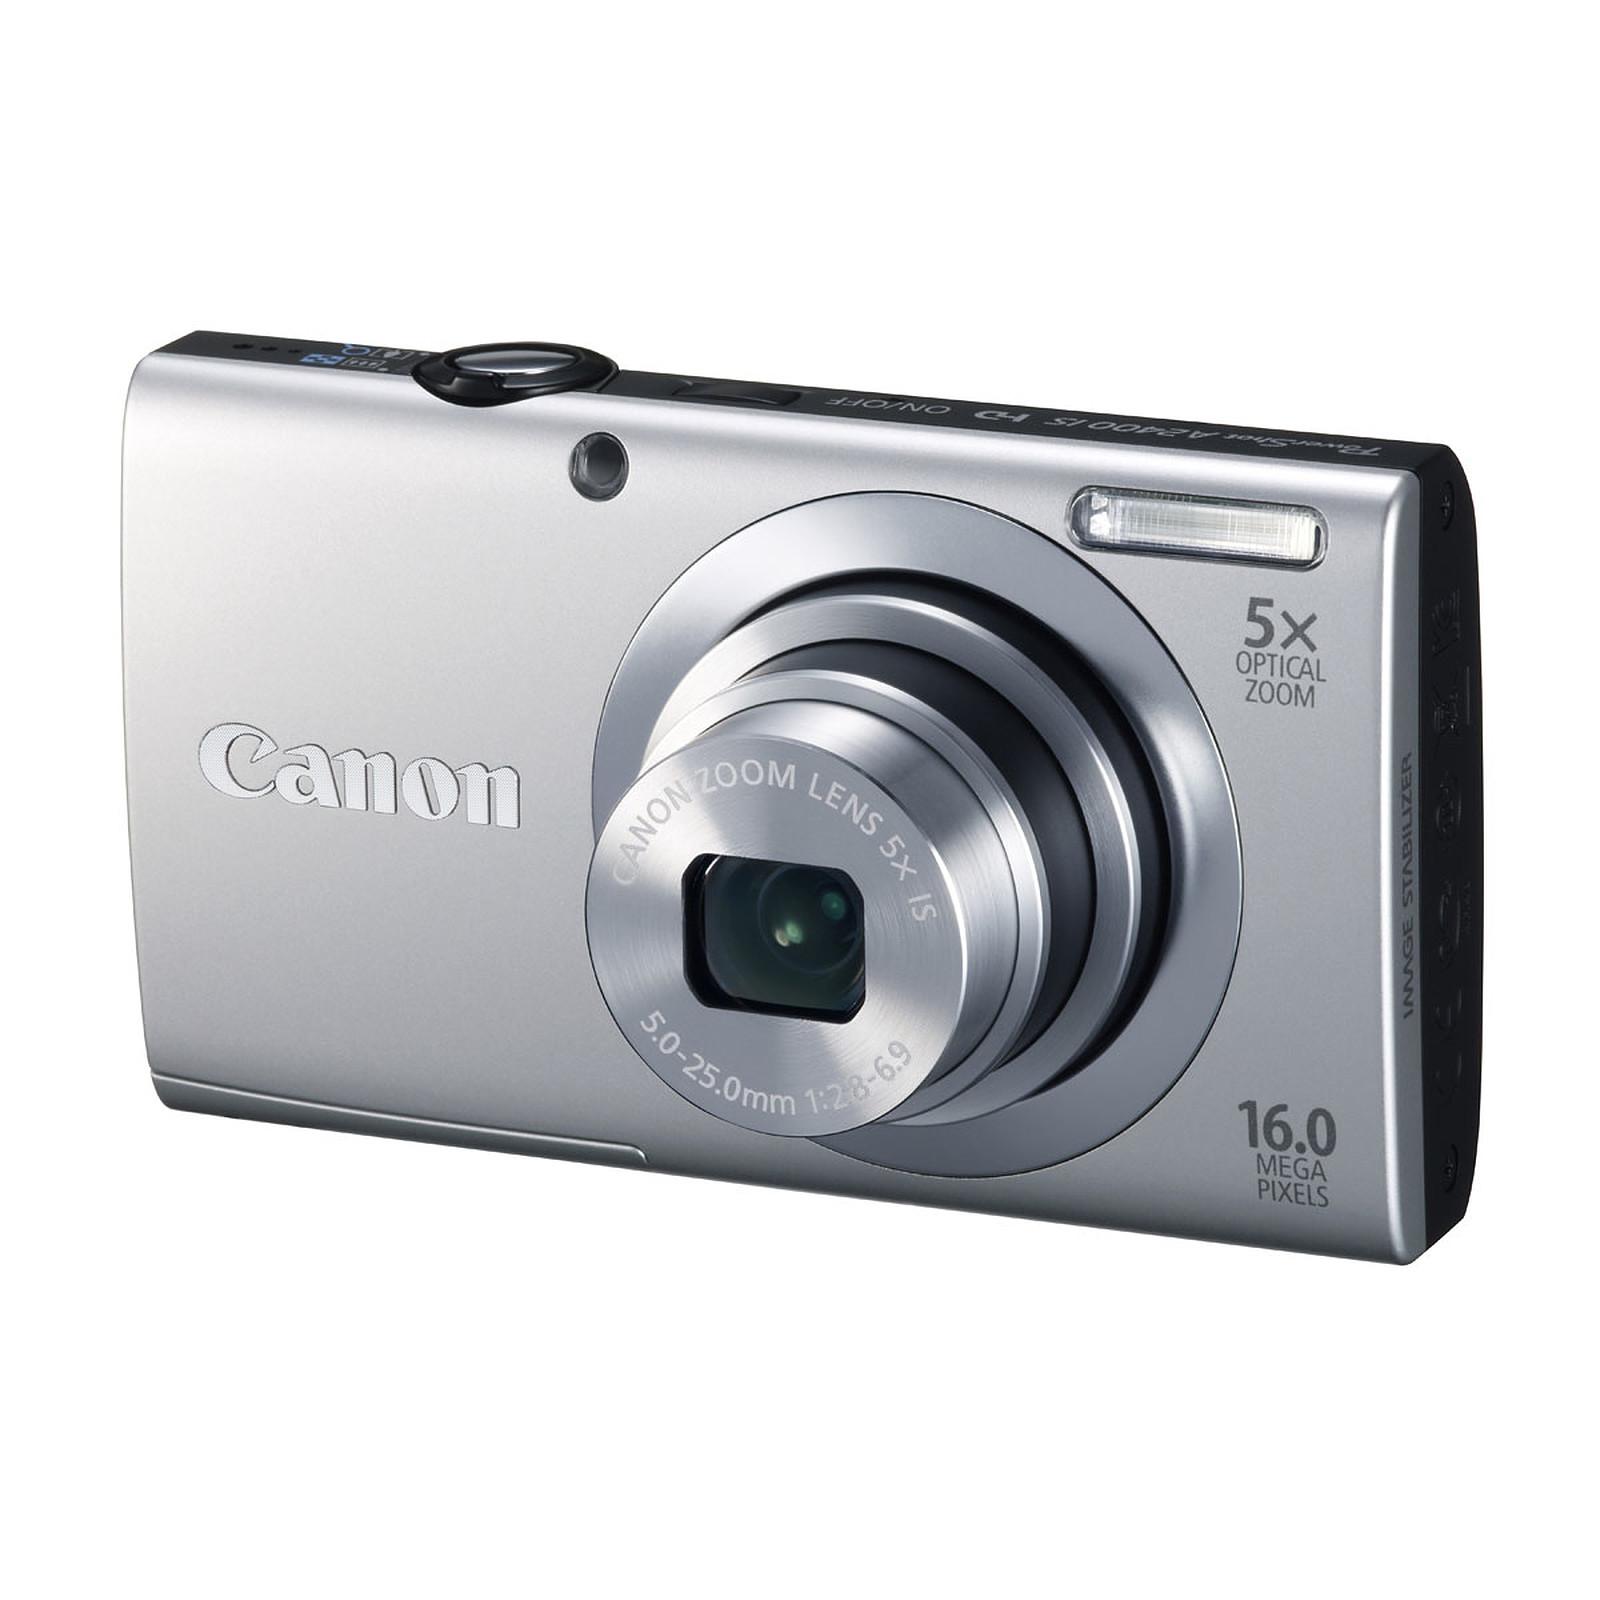 Canon Powershot A2400 IS Argent